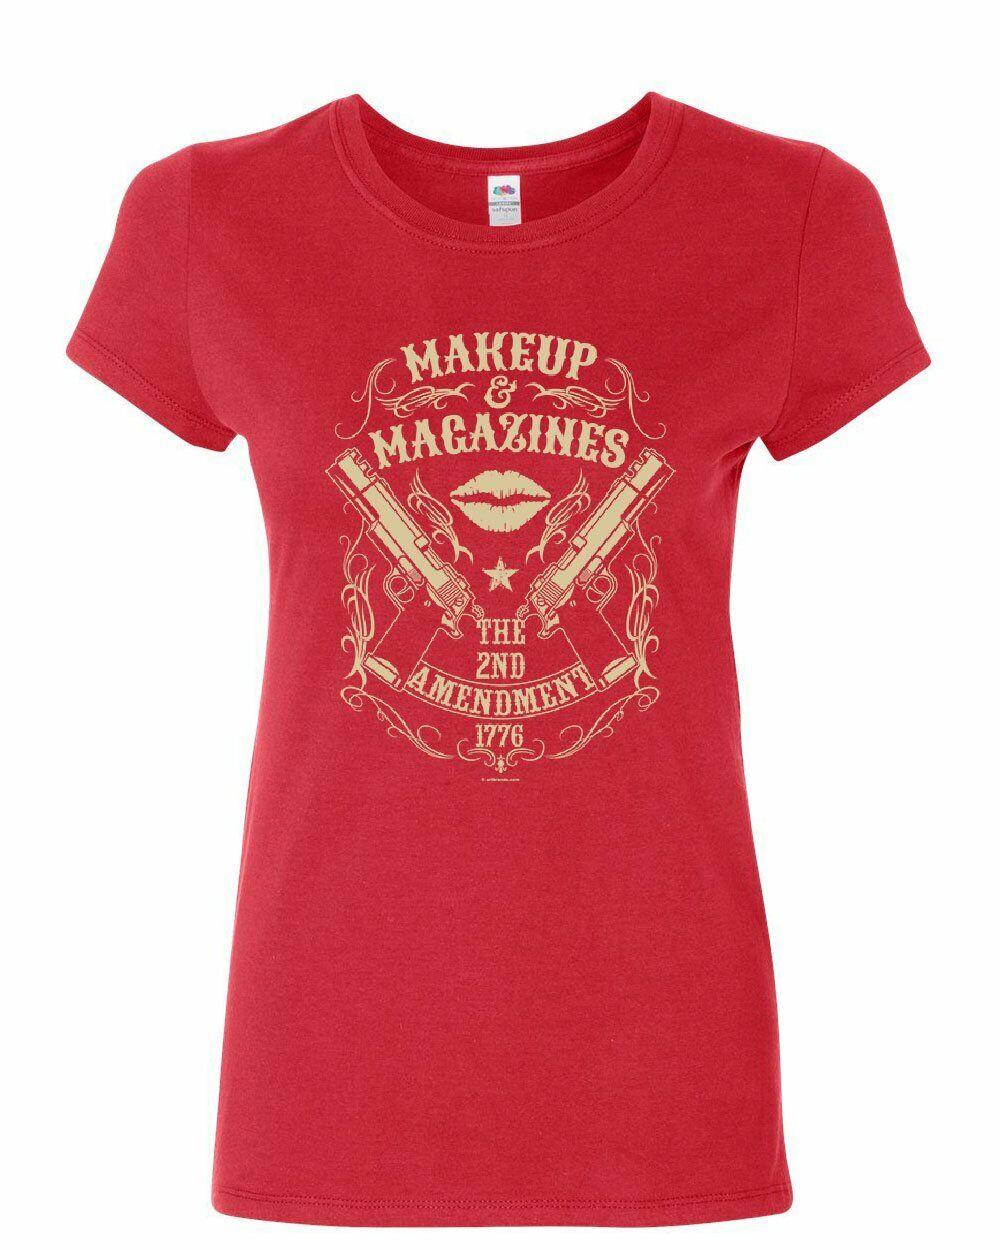 Make Up /& Magazines The 2nd Amendment 1776 Women/'s Long Sleeve Tee Gun Rights